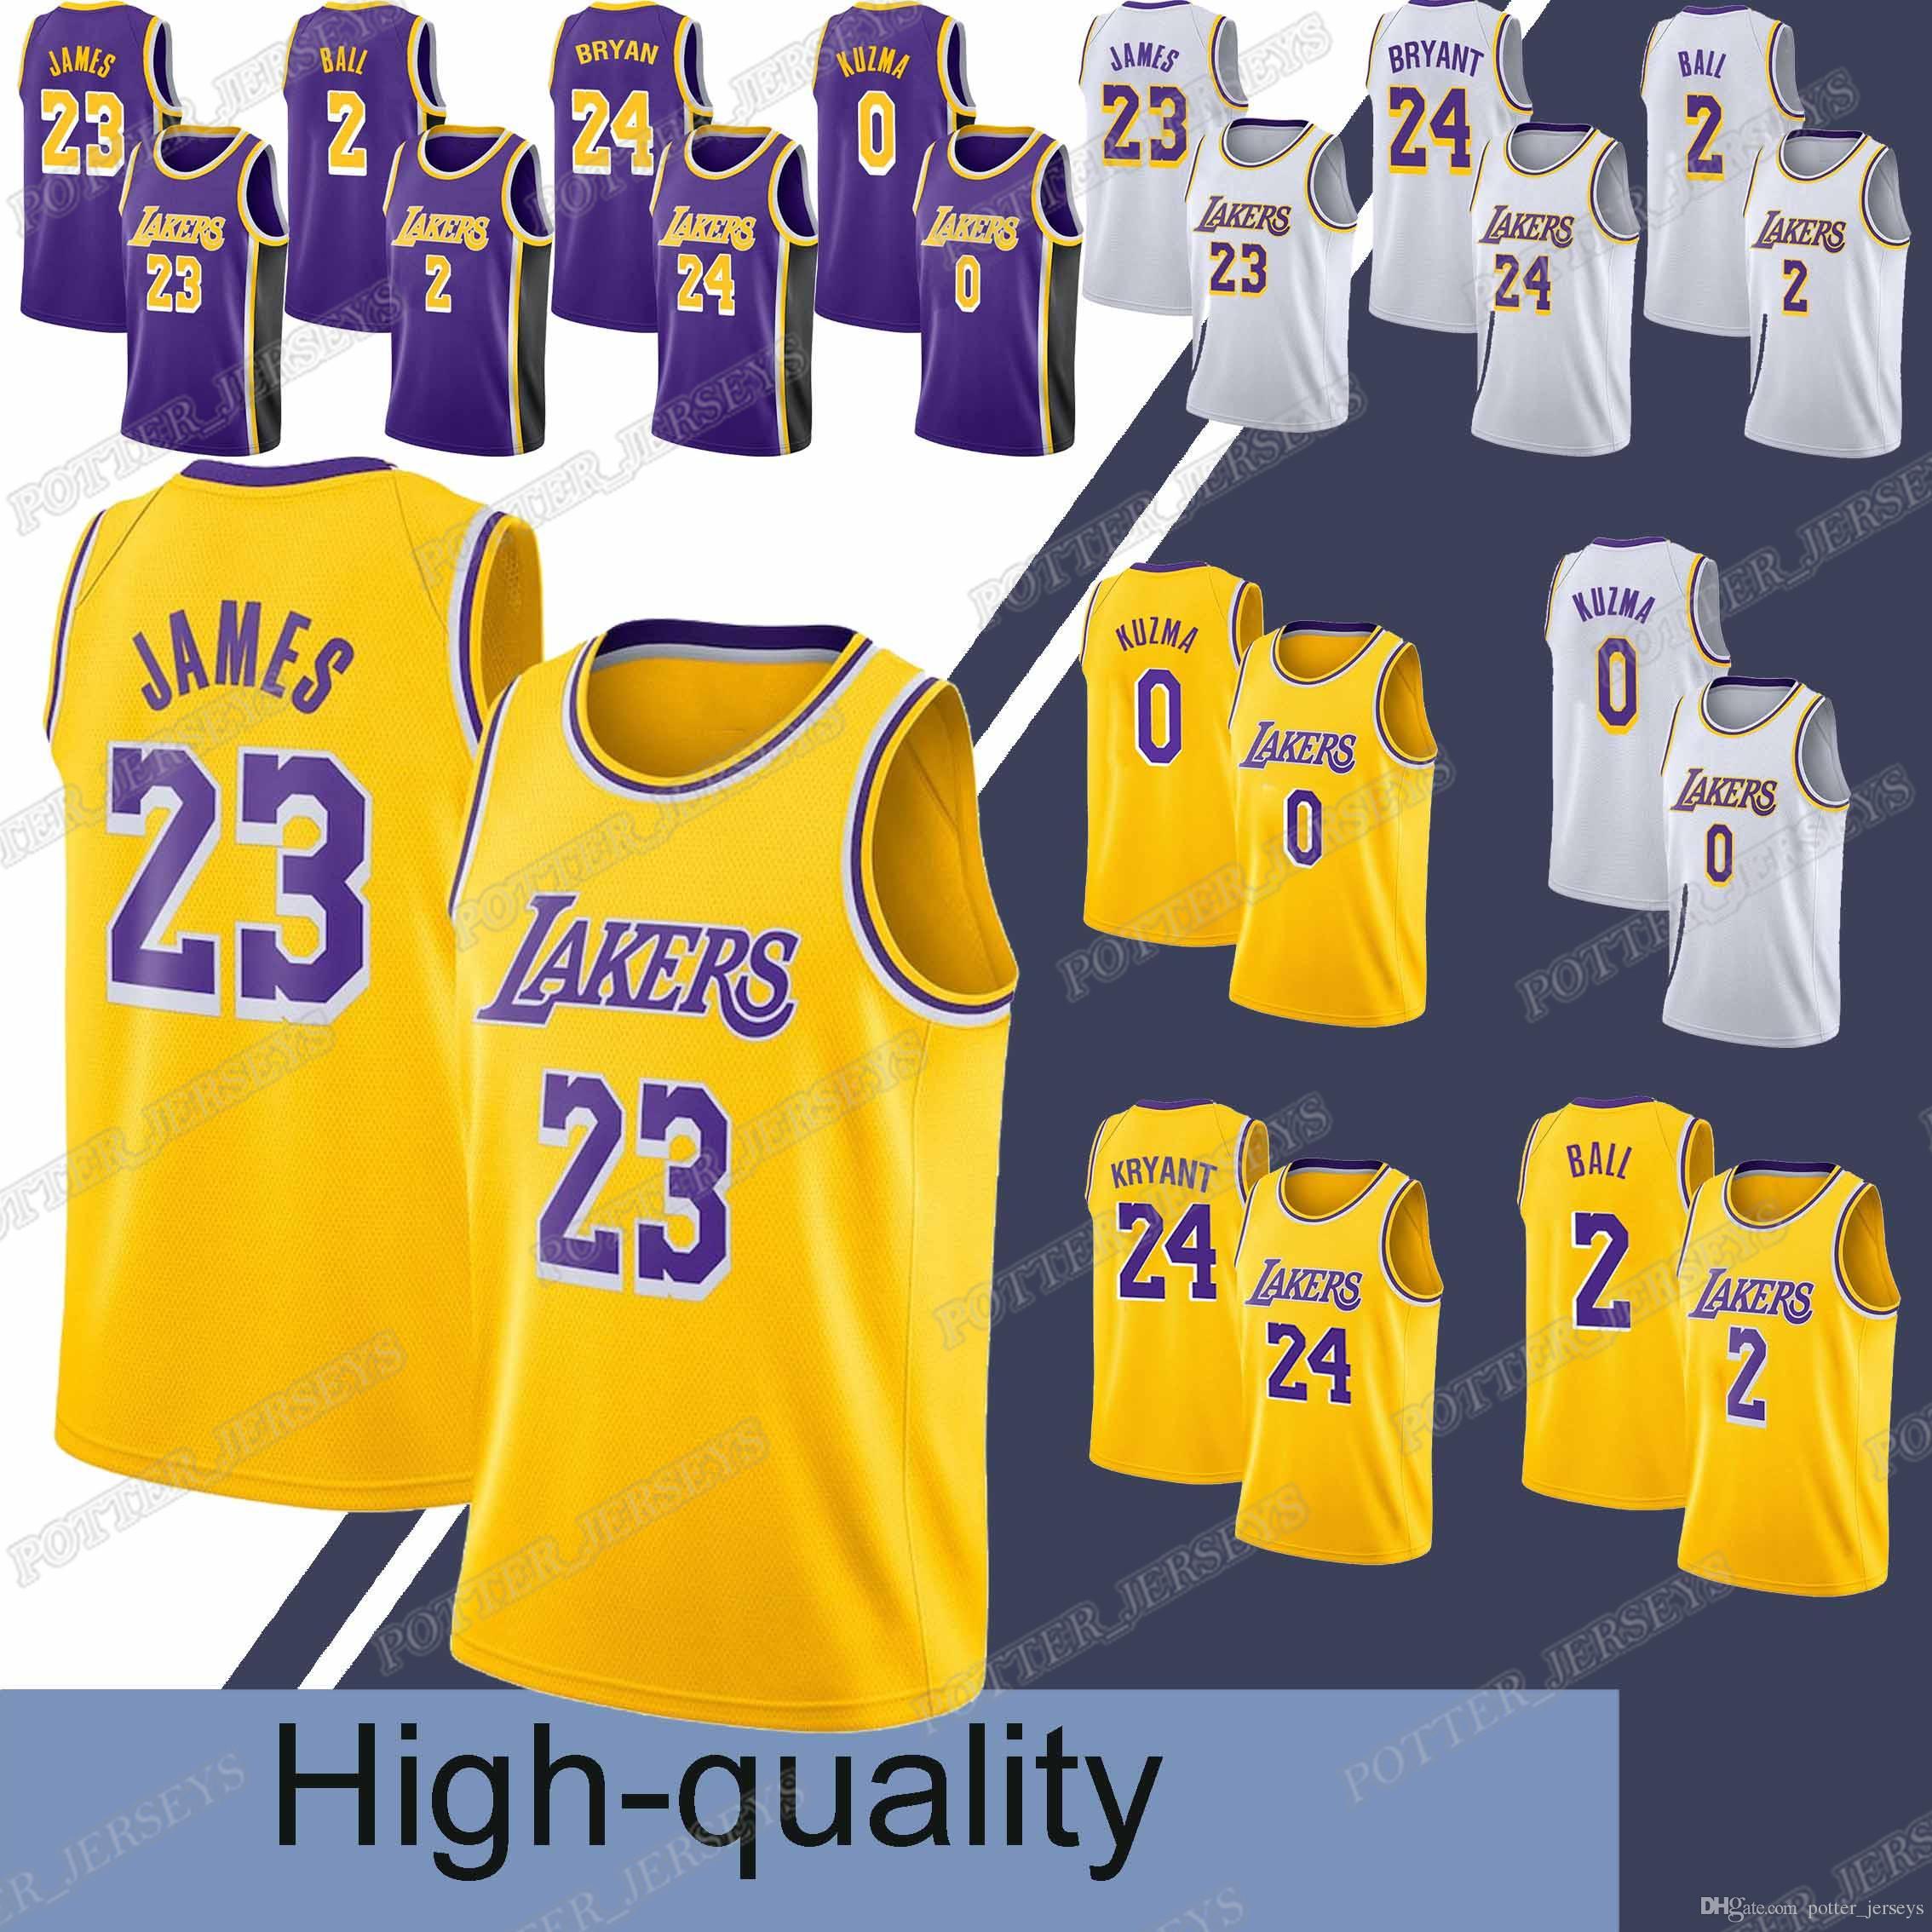 best service eed5d 959eb 23 LeBron James jersey Laker jerseys 24 Bryant 0 Kuzma 2 Ball Hot sale 2019  men basketball jerseys